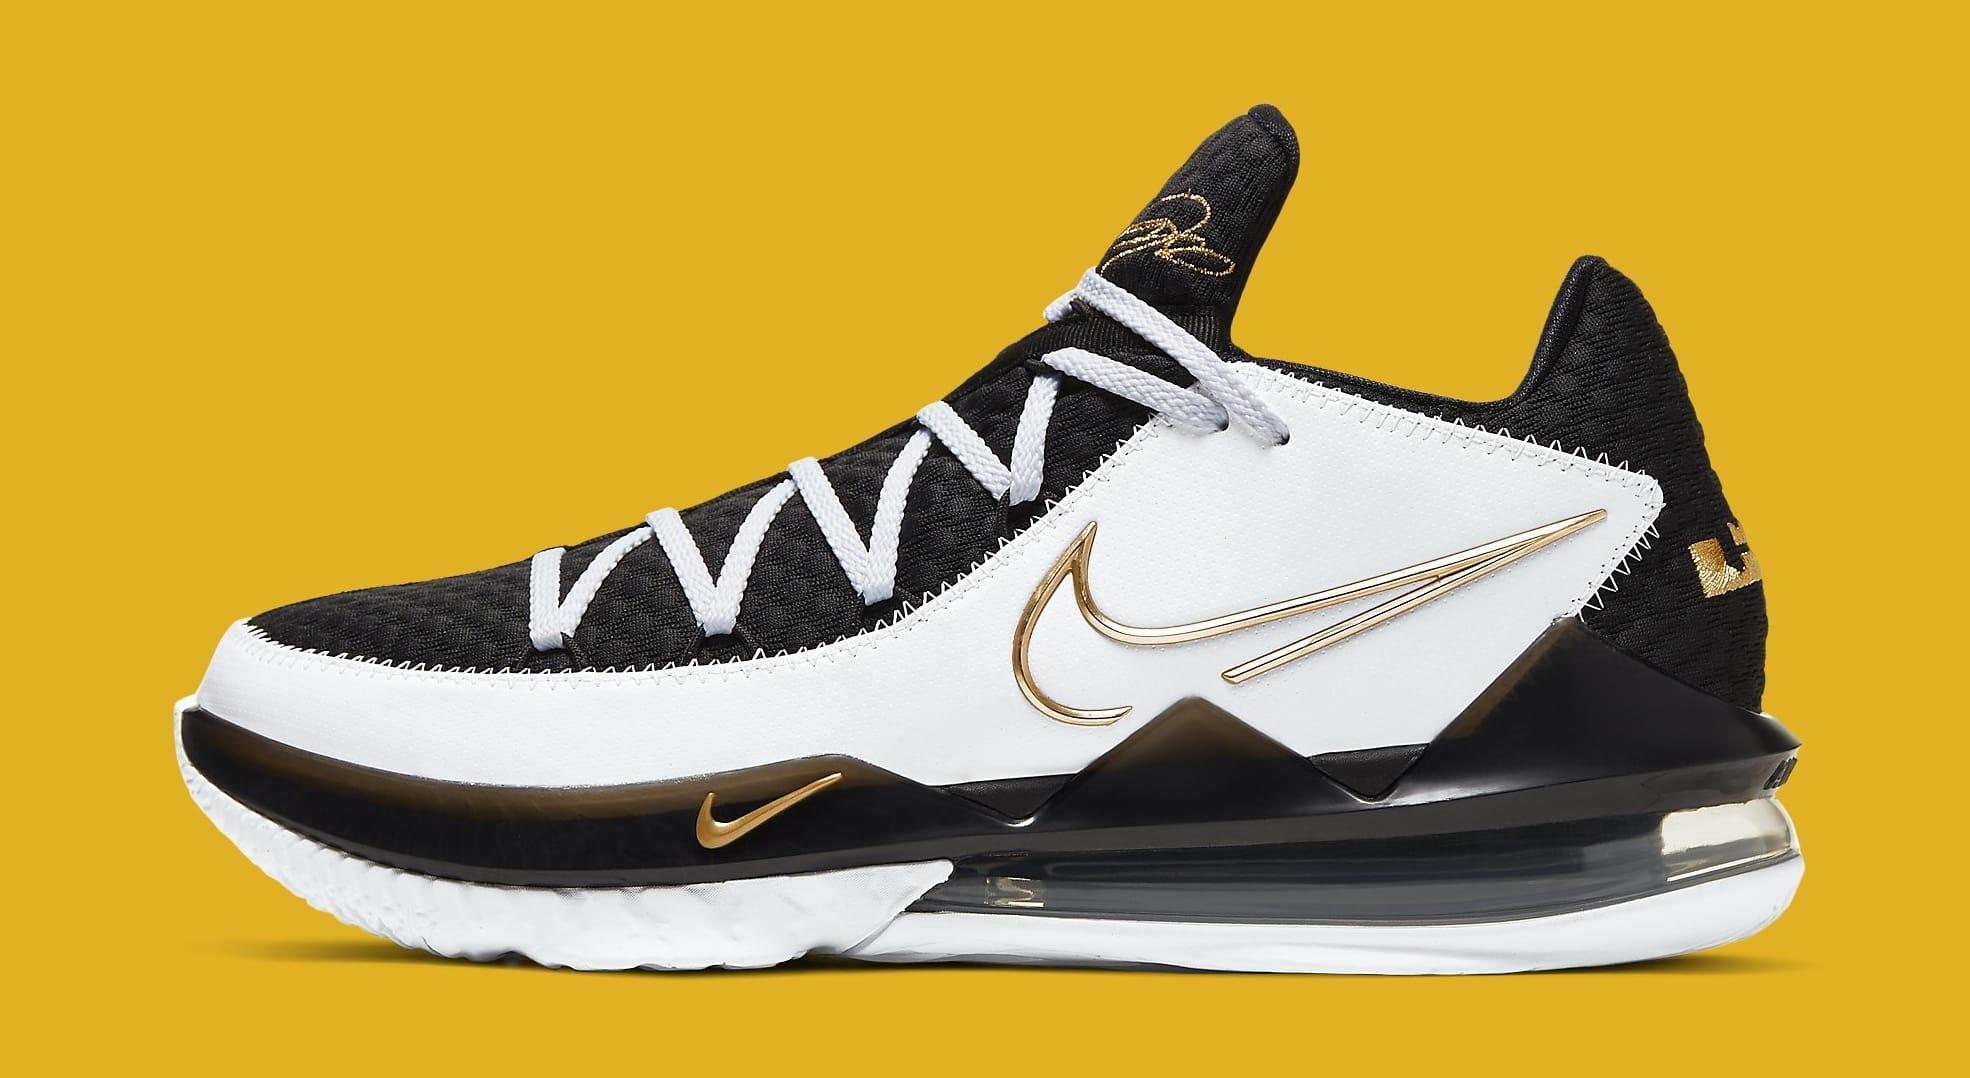 Nike LeBron 17 Low 'Metallic Gold' CD5007-101 Lateral